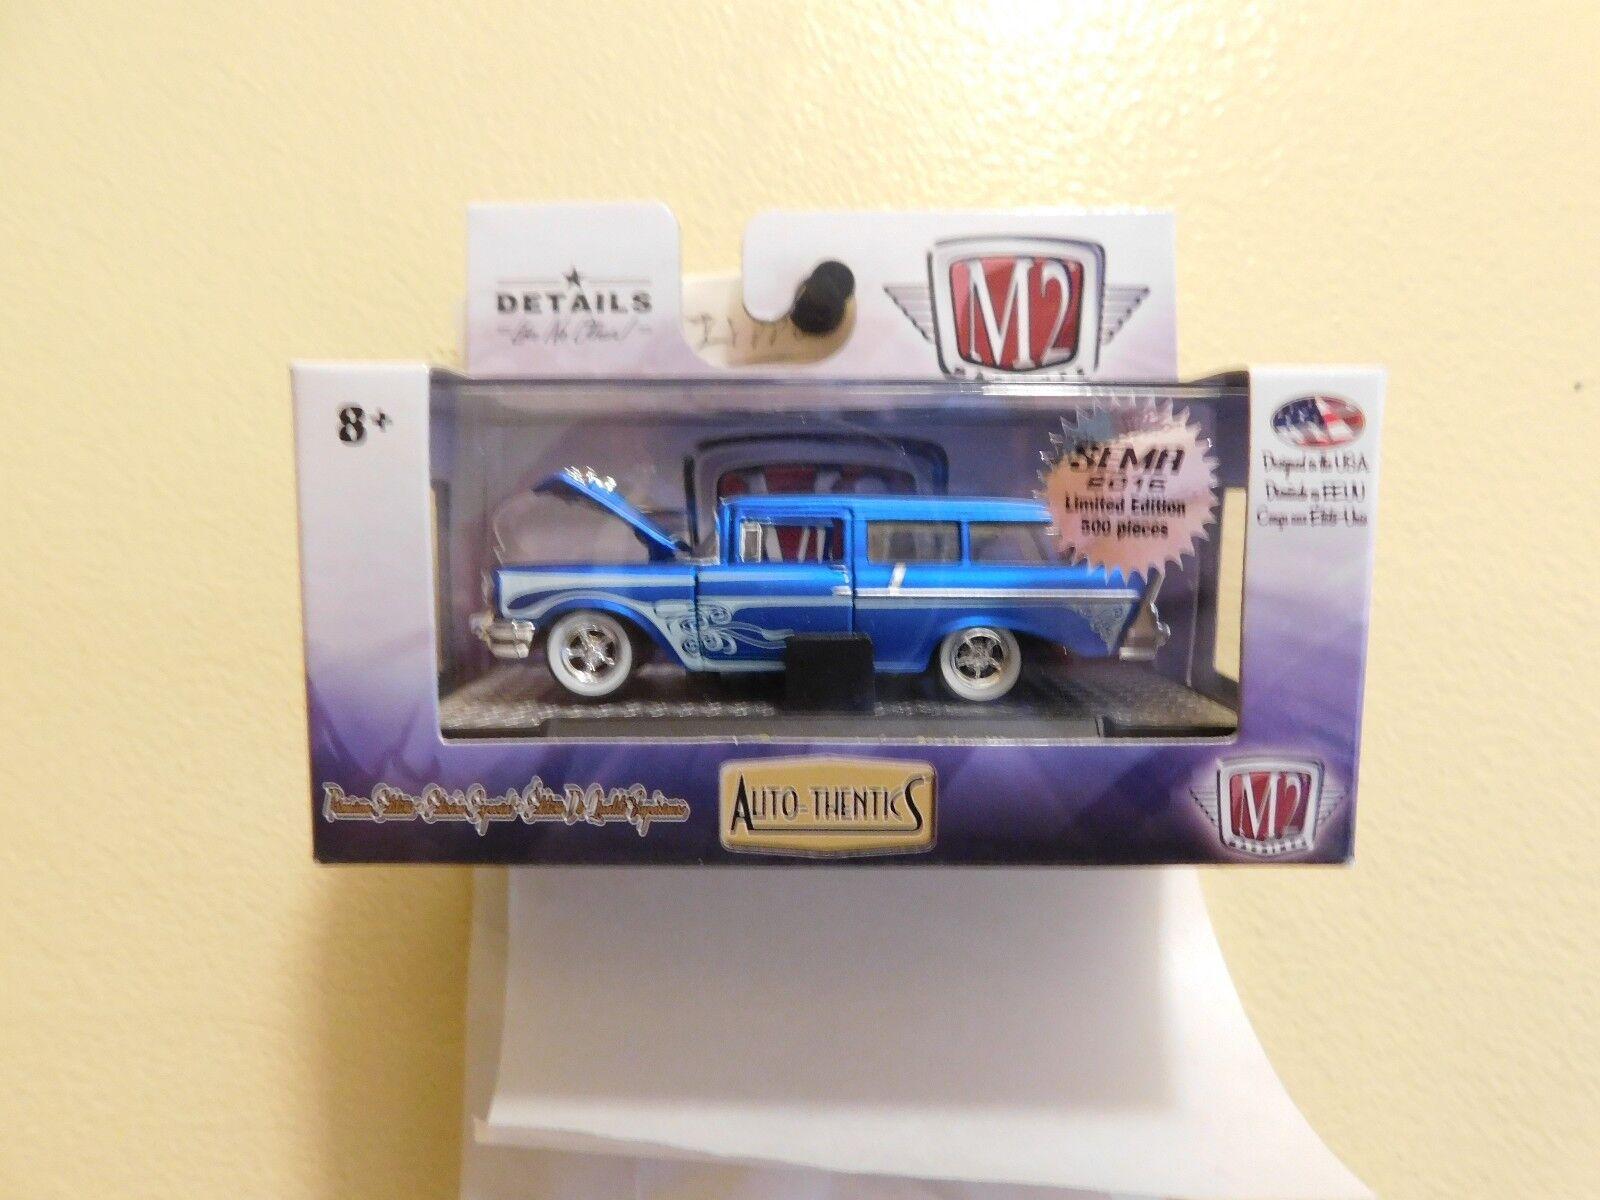 L39 M2 máquinas autothentics 1957 Chevrolet 150 Handyman Station Wagon Sema 500